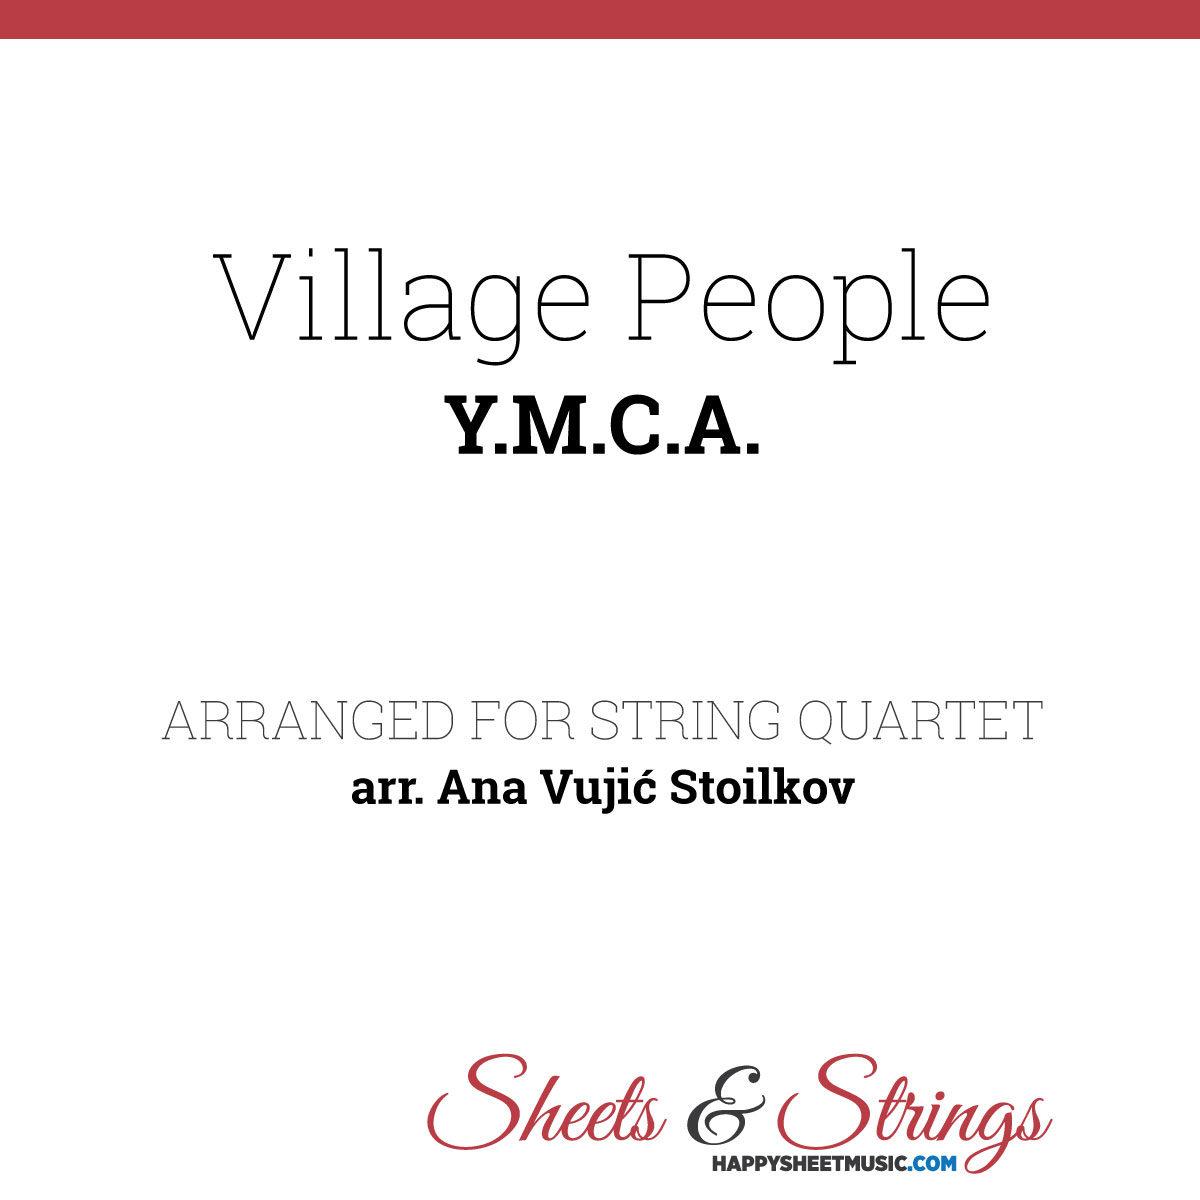 Village People - Y.M.C.A. Sheet Music for String Quartet